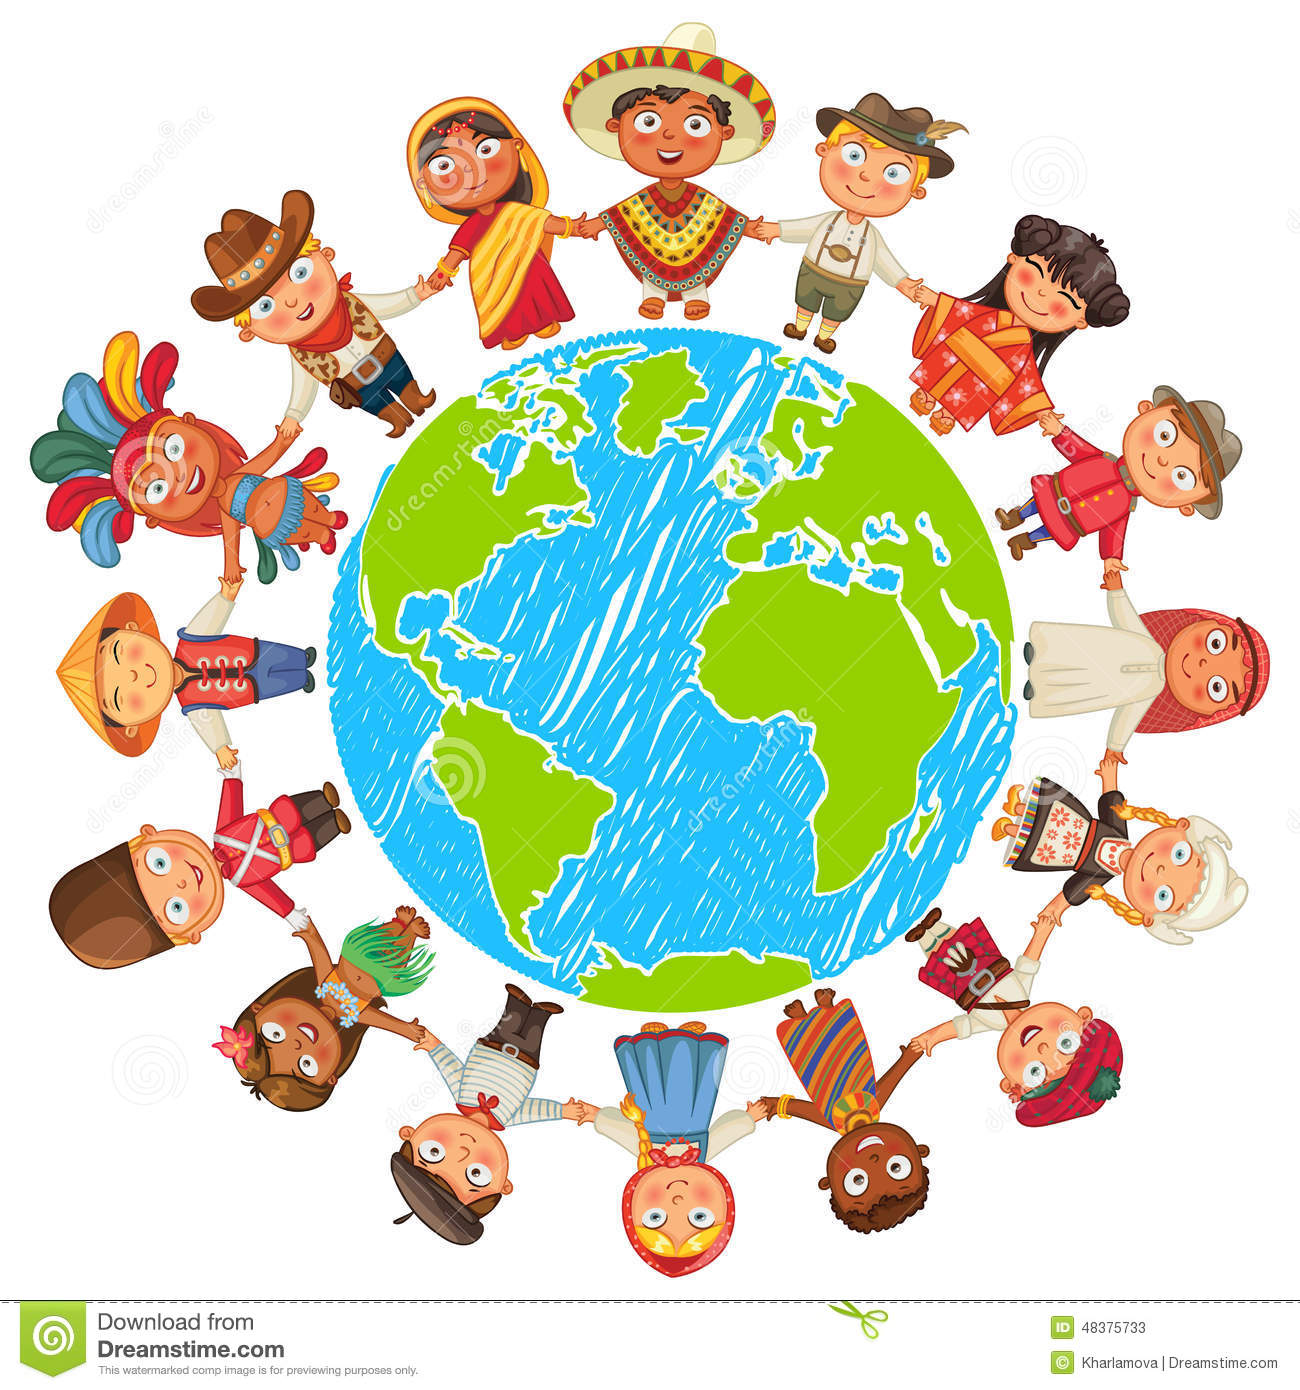 Culture clipart world culture #8